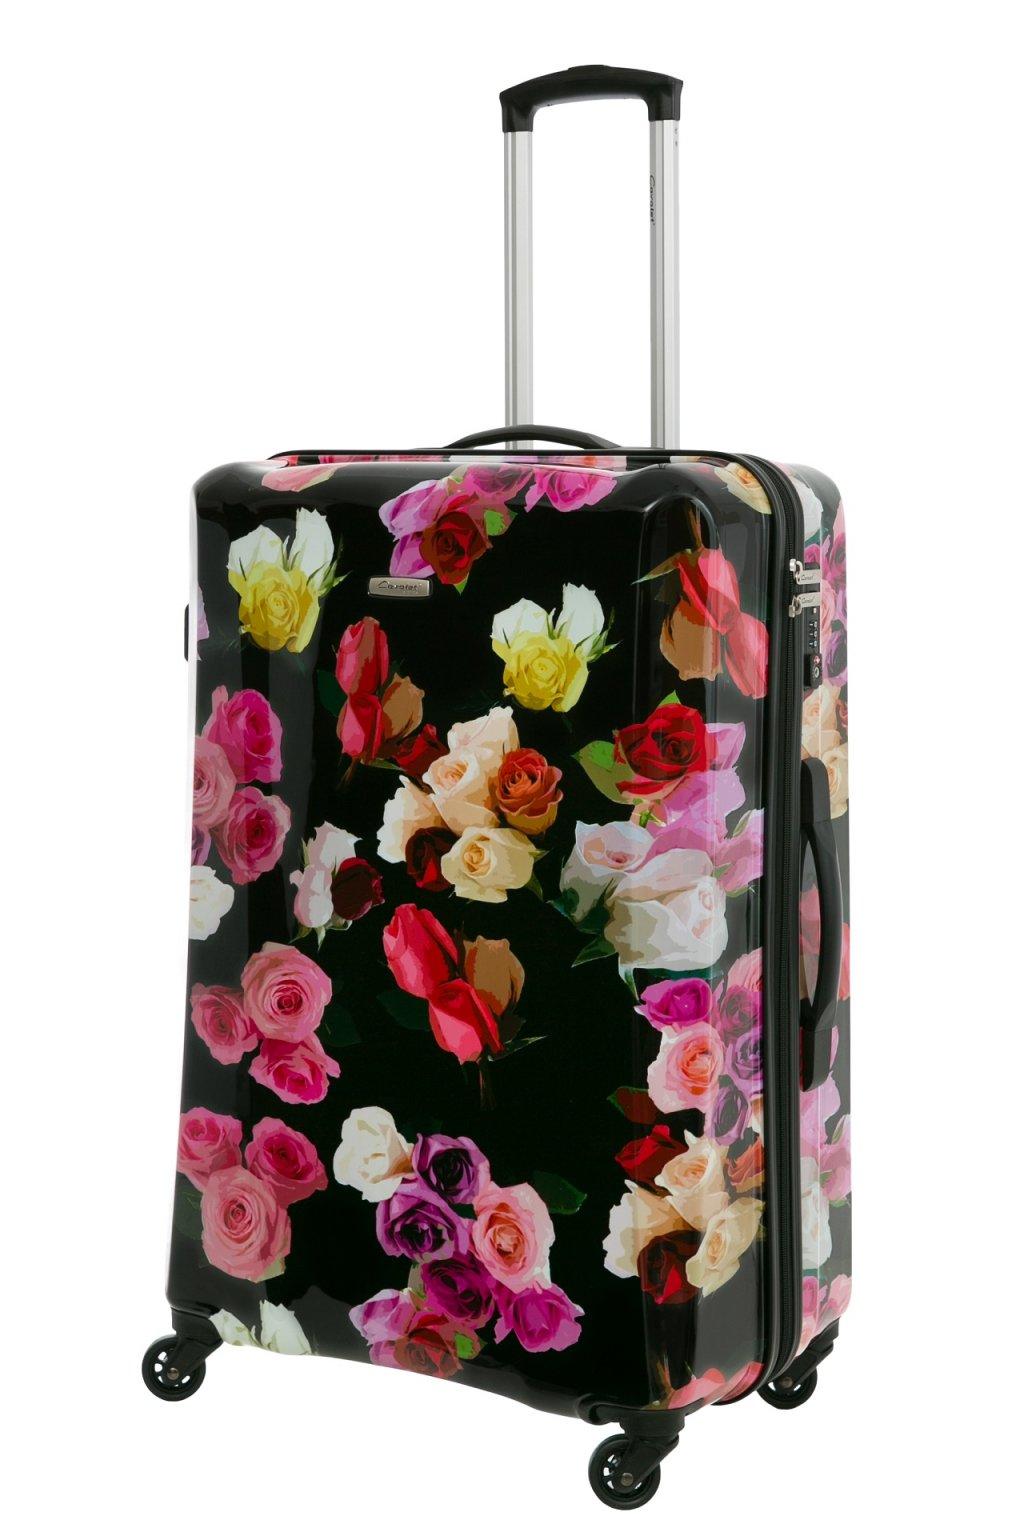 kufrland cavalet rose flower black (16)